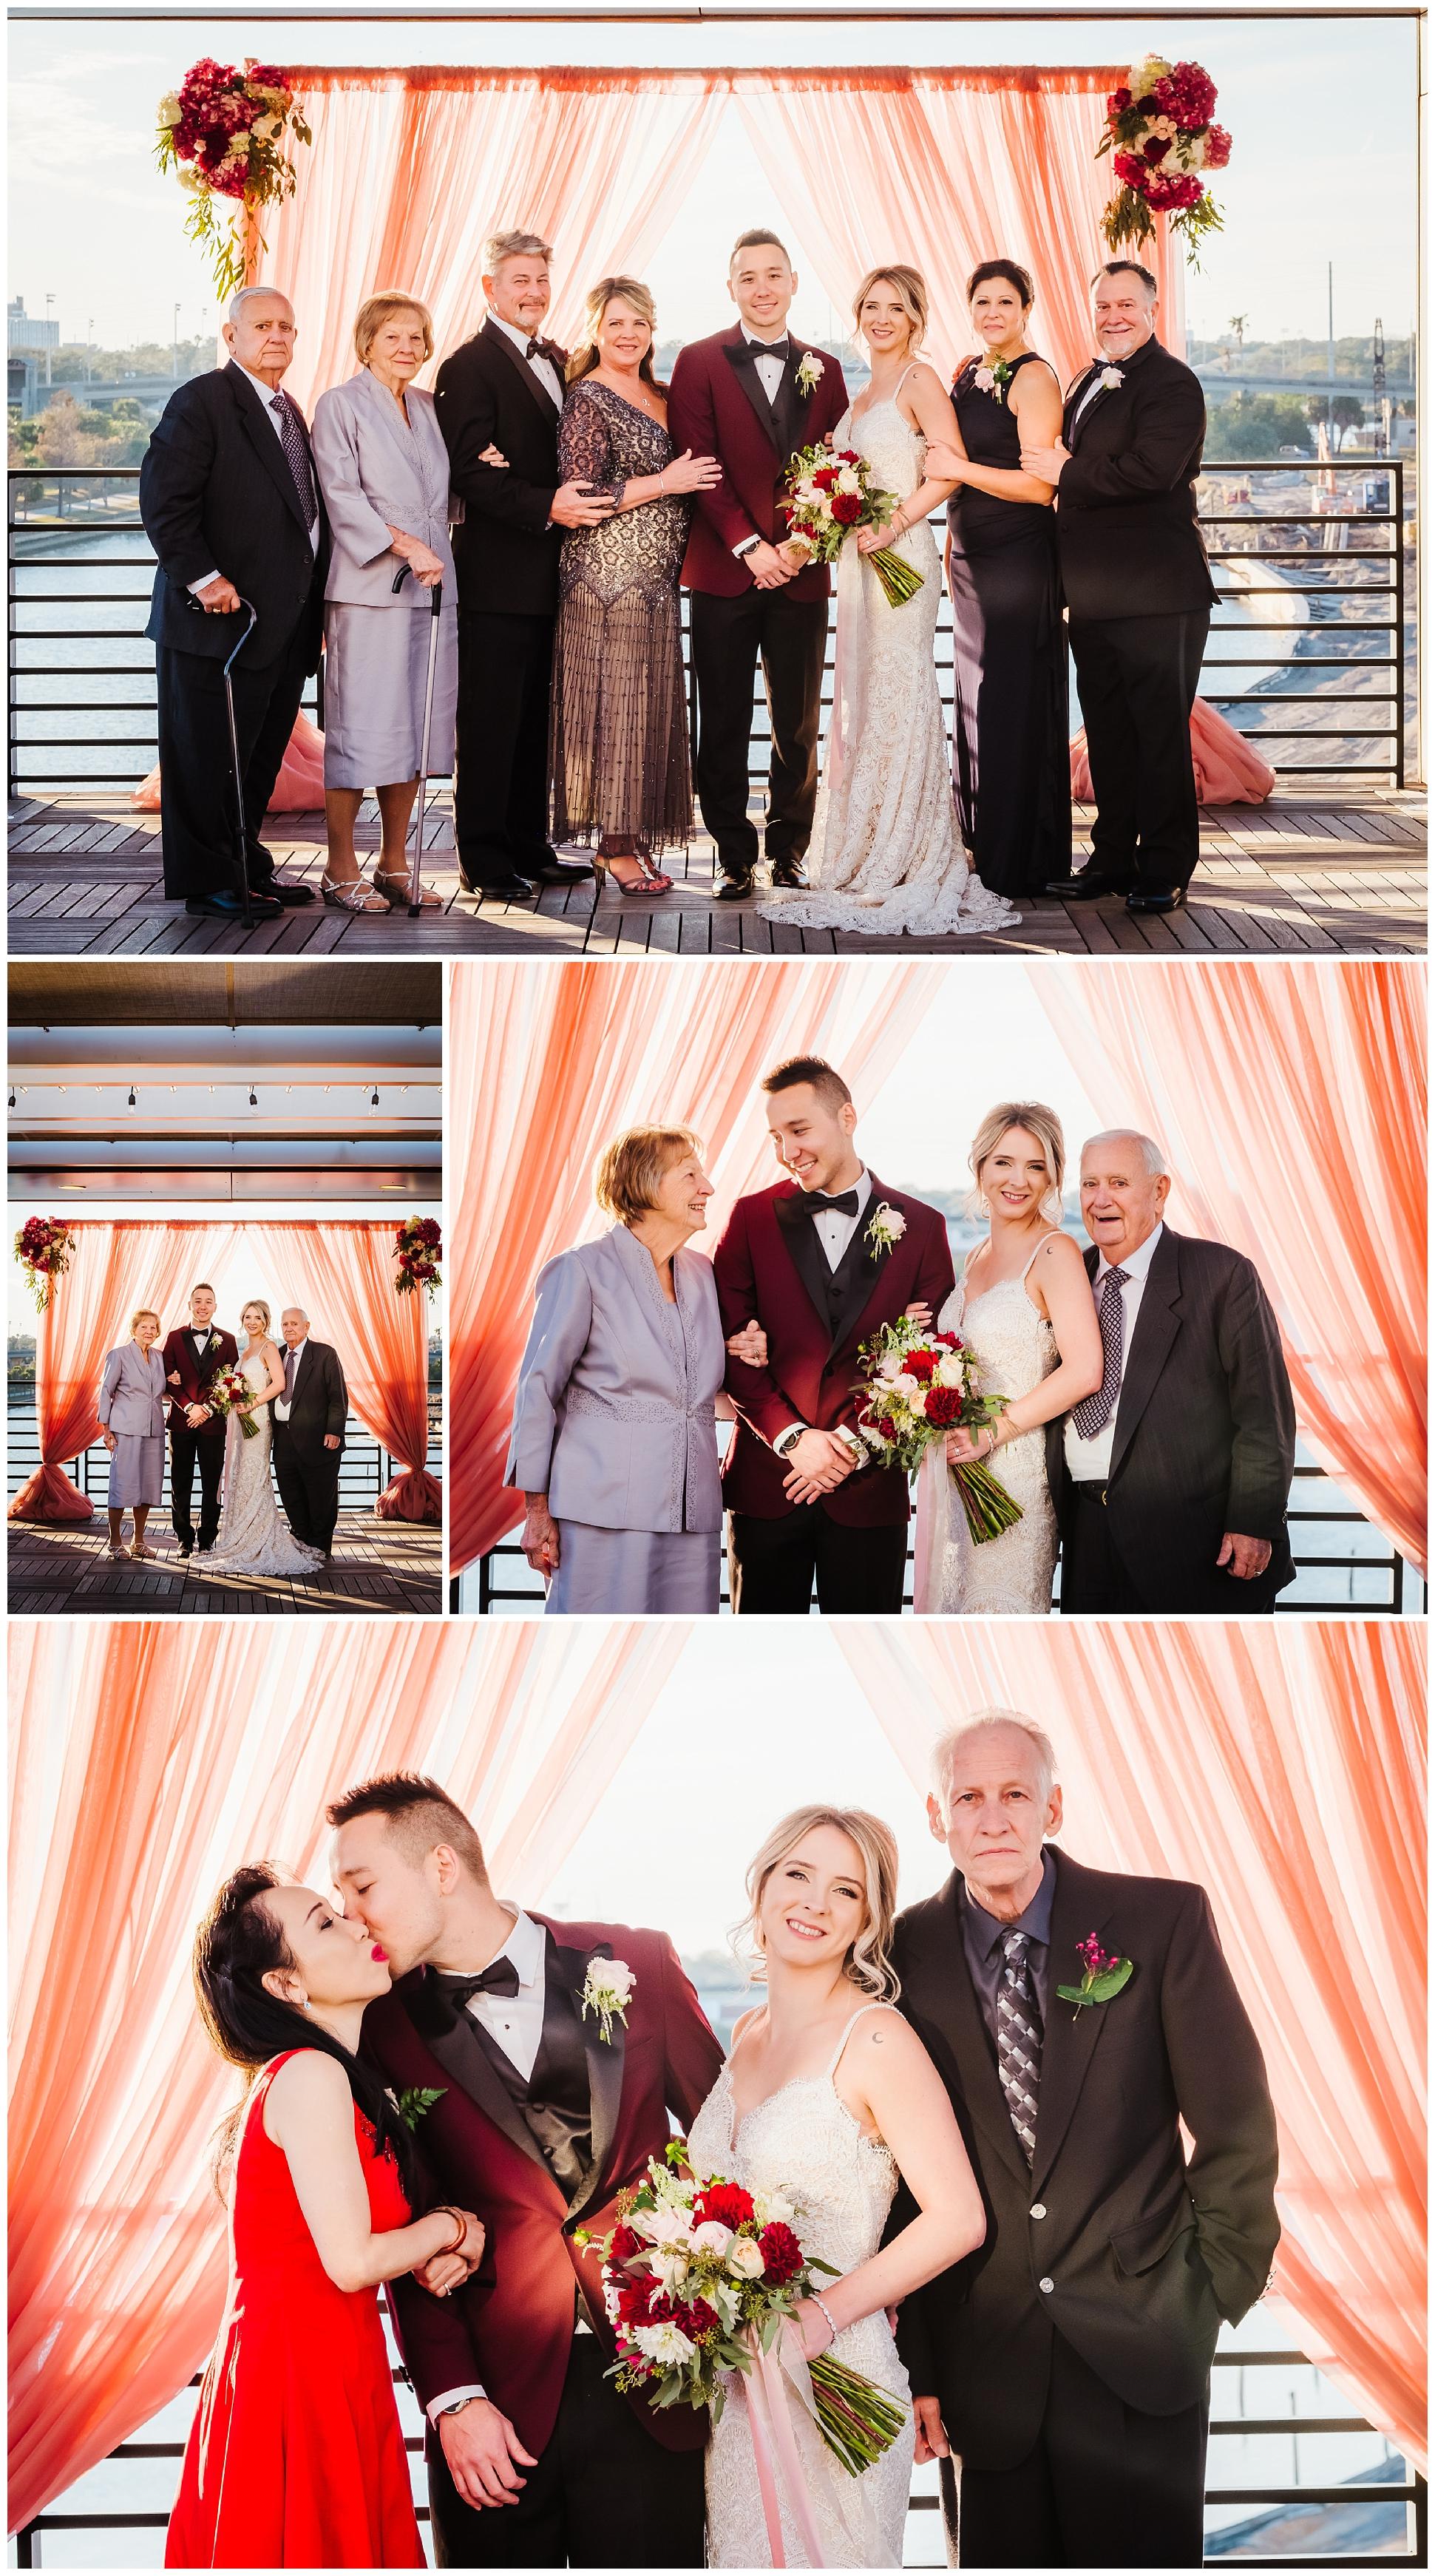 tampa-armeture-wedding-photographer-edgy-industrial-downtown-fancy-free-nursery-tattoo-burgandy-velvet_0054.jpg